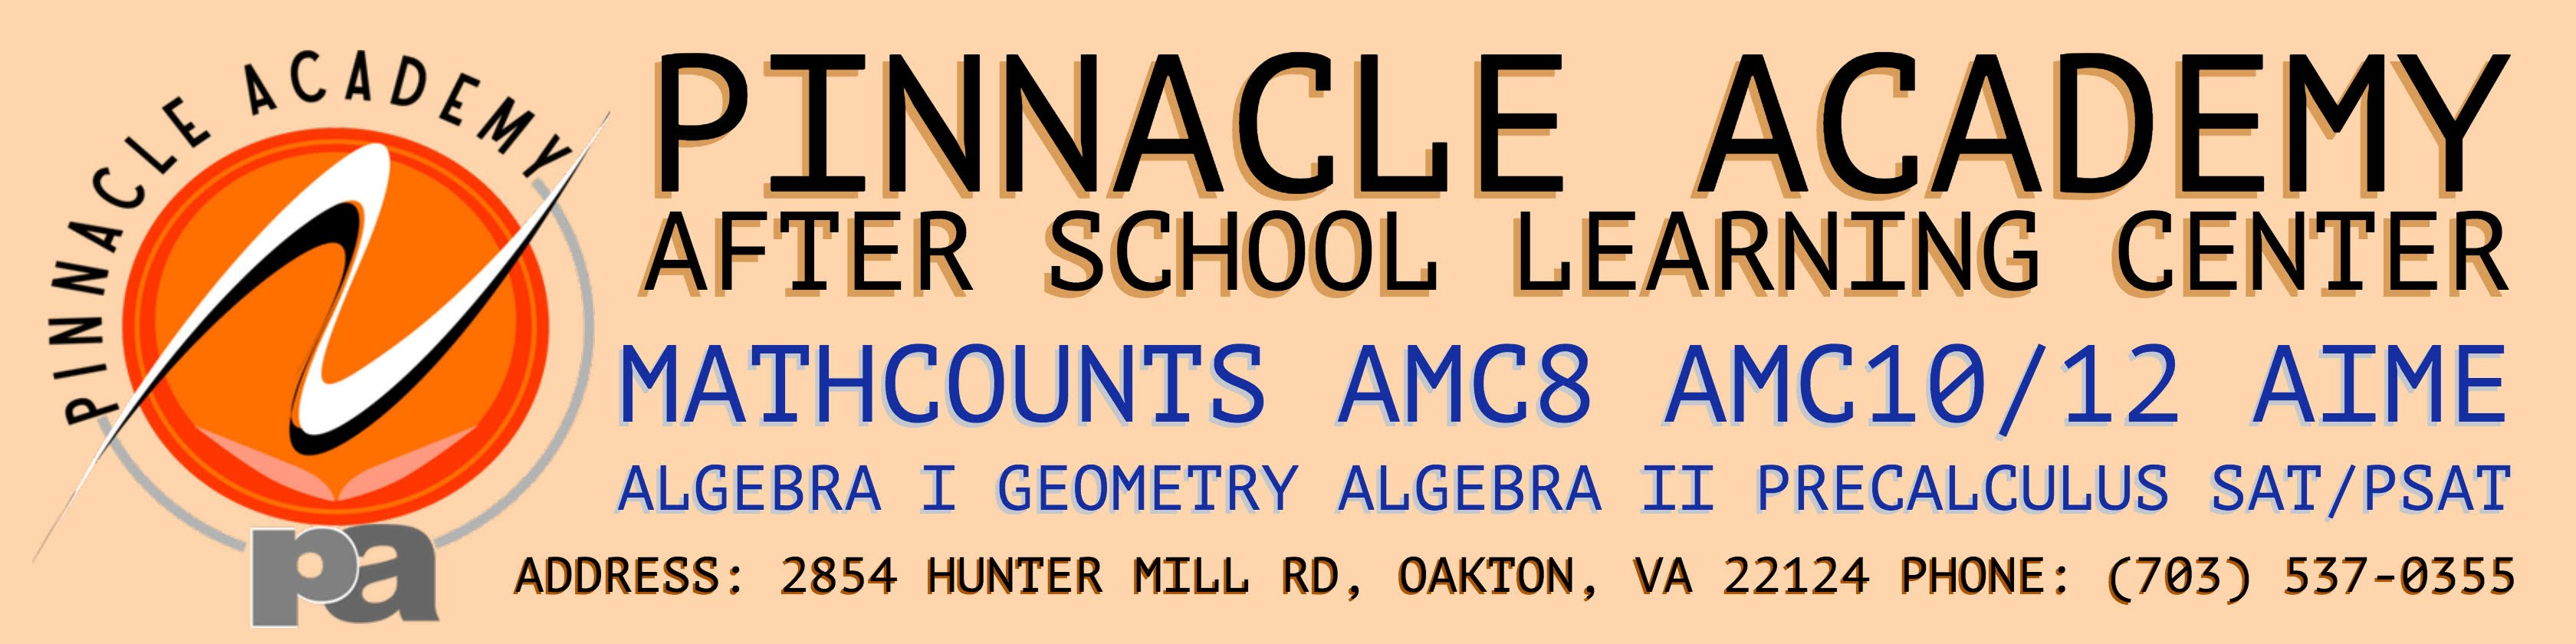 http://www.cinfoshare.org/education/pinnacle-academy-after-school-program